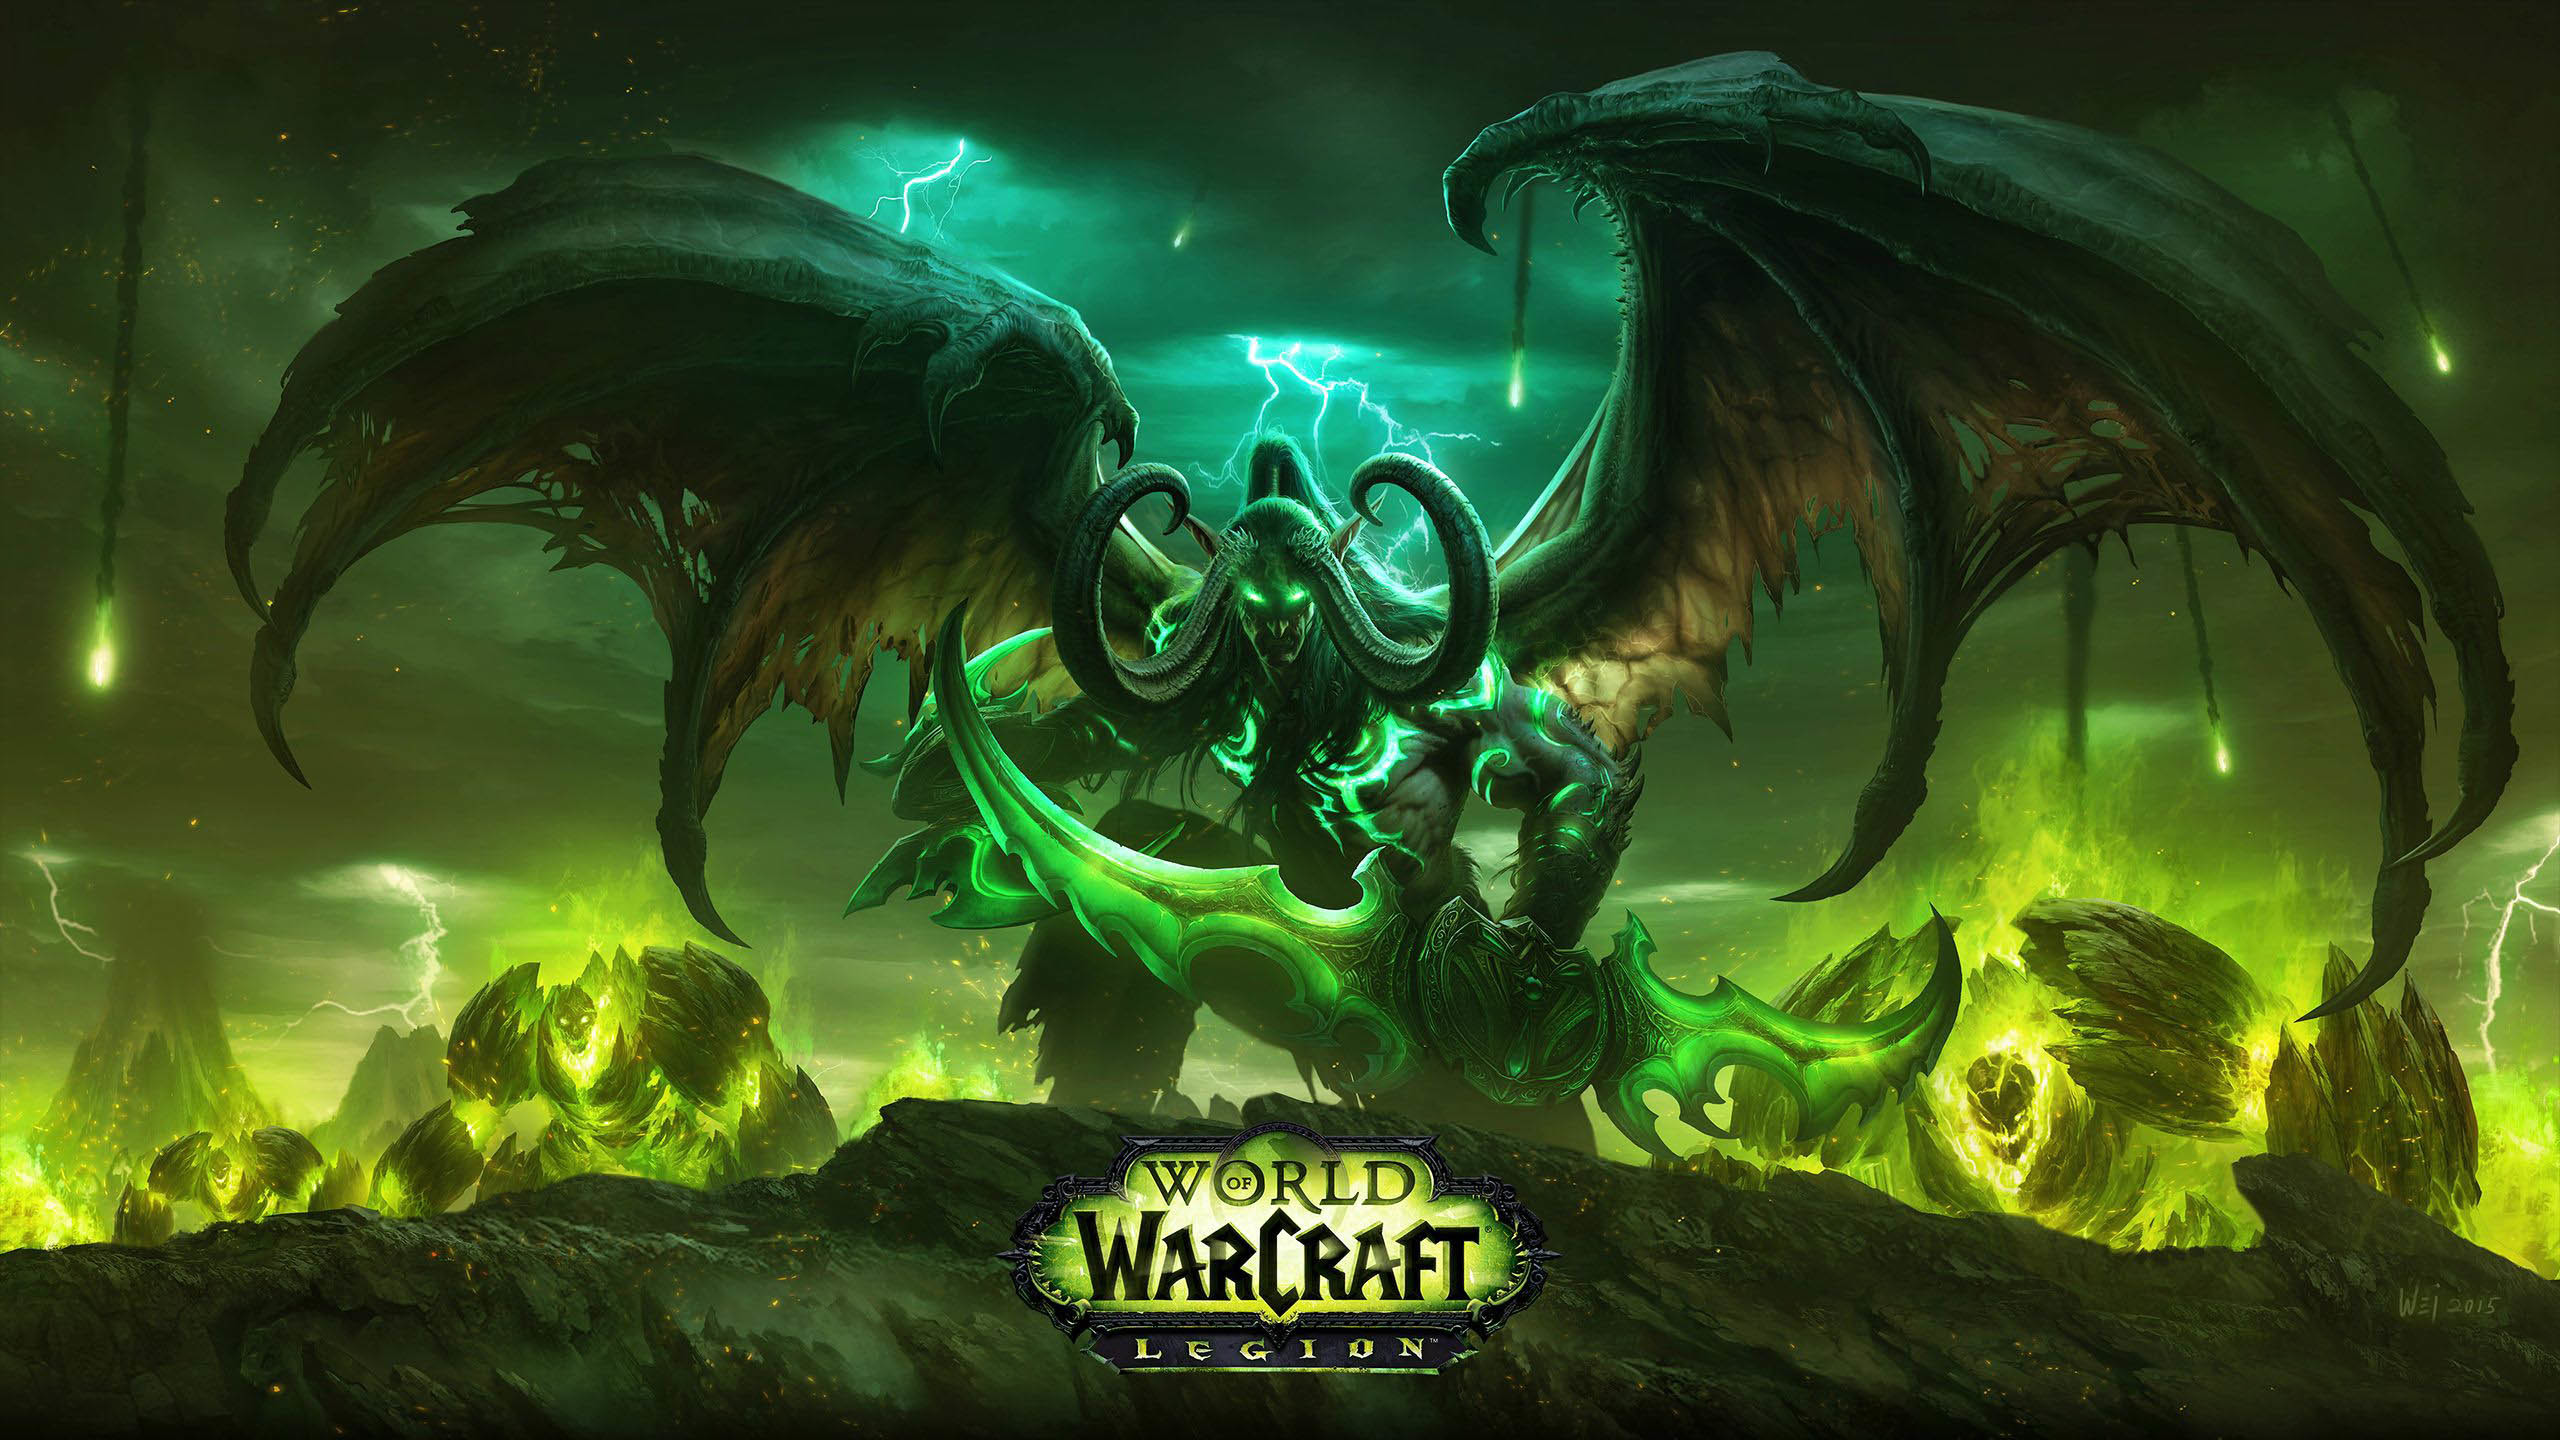 WoW Legion – Illidan Stormrage the Demon Hunter wallpaper